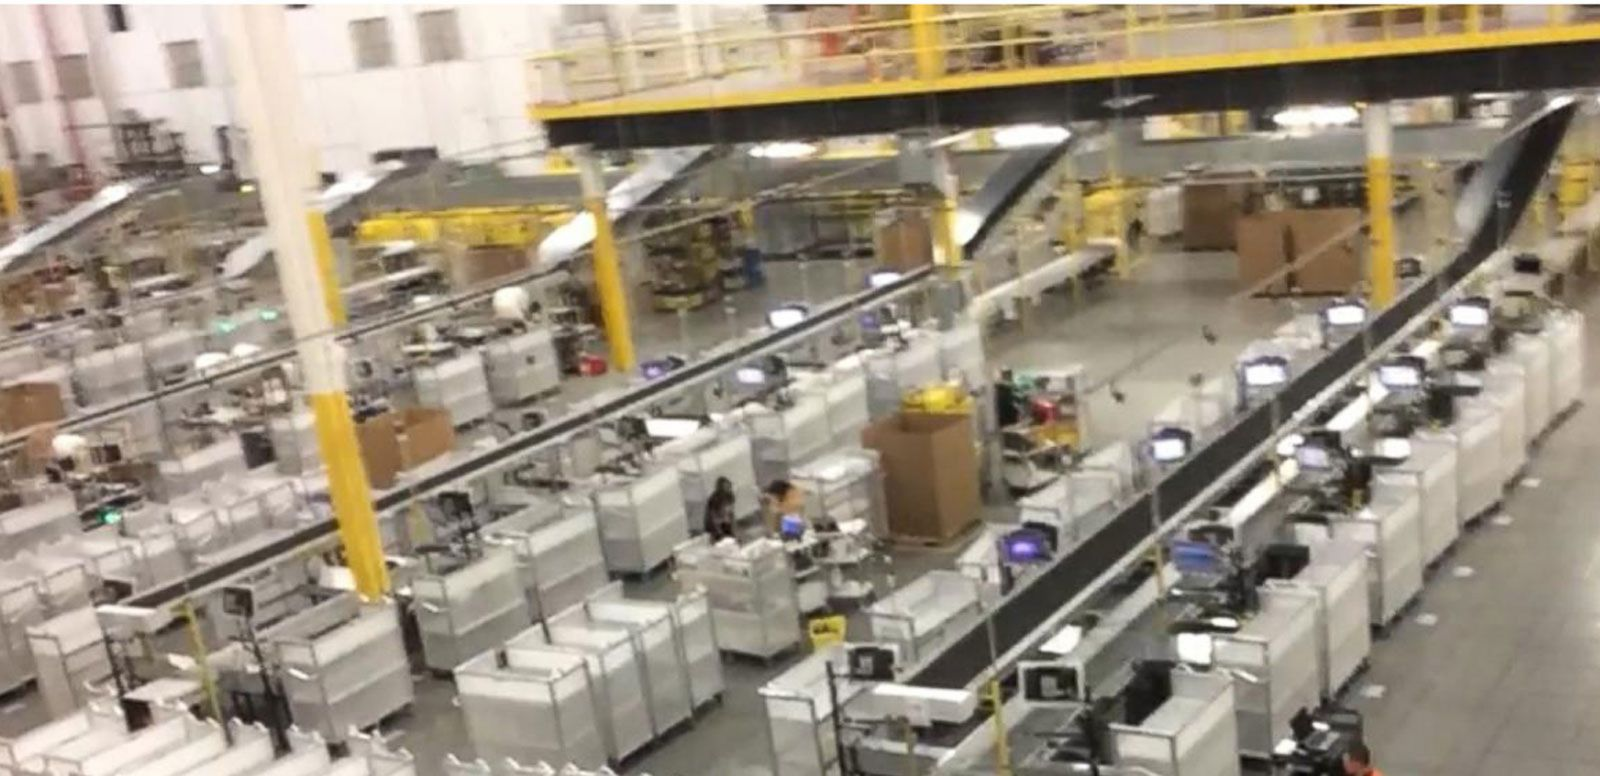 VIDEO: Cyber Monday: Inside an Amazon Fulfillment Center